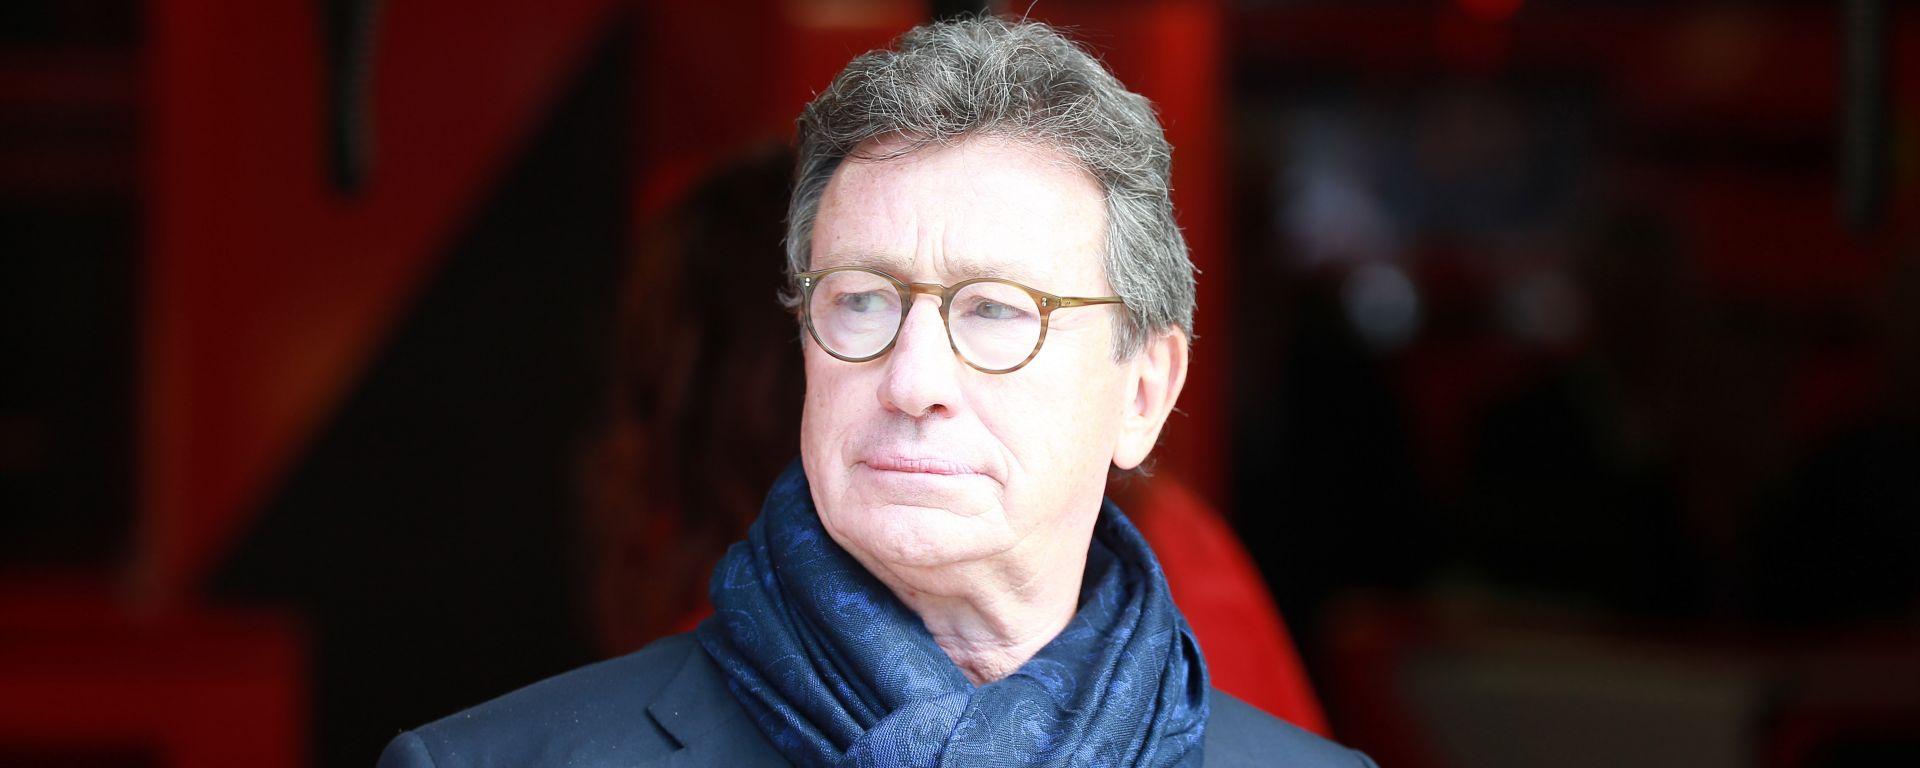 F1 GP Italia 2019, Monza: Louis Camilleri, CEO Ferrari